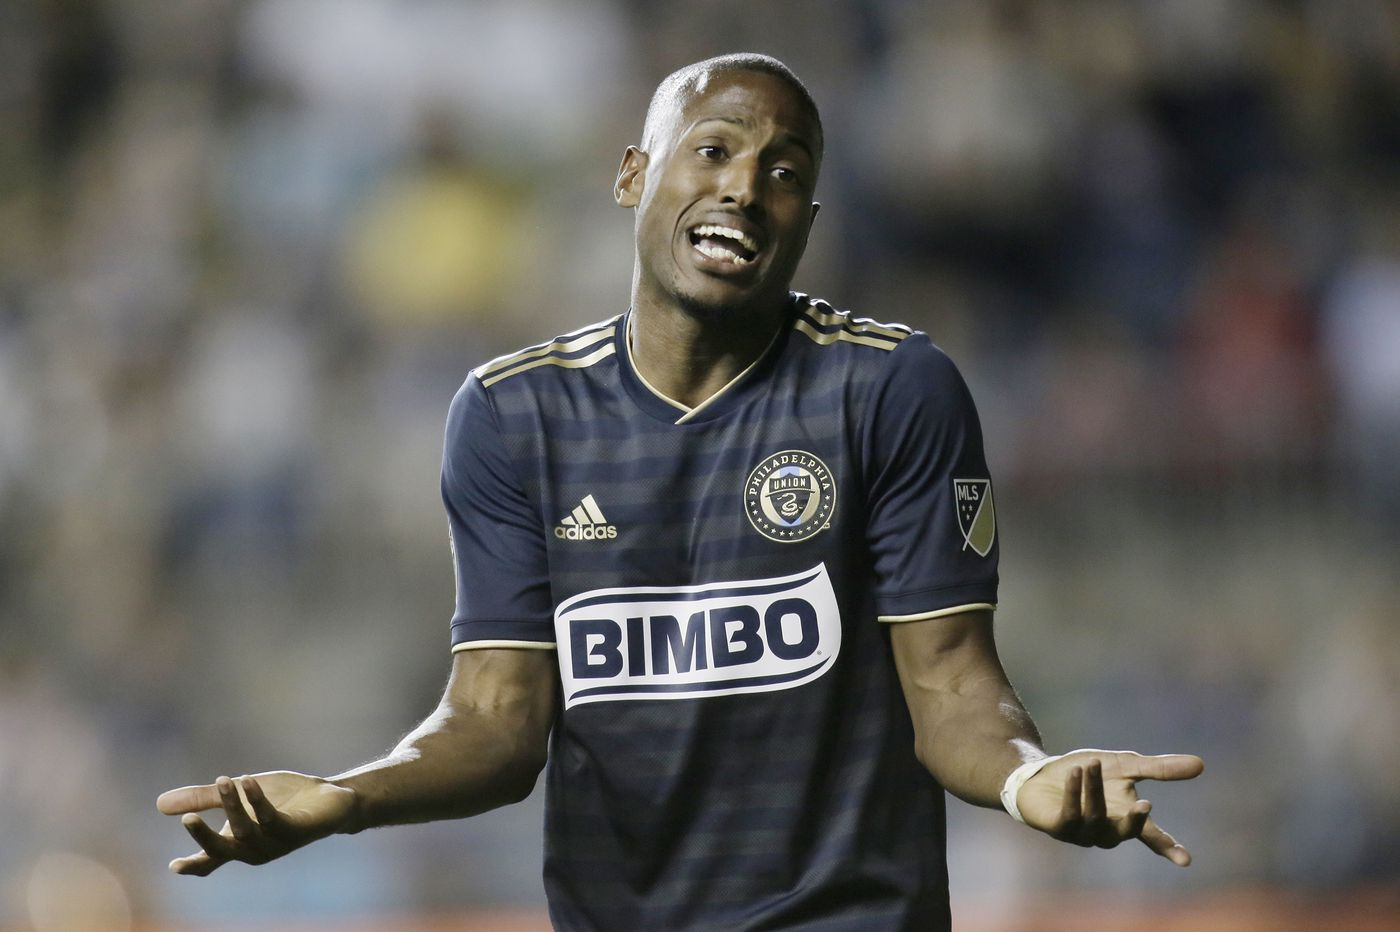 Union kick off season against FC Dallas in reunion with Fafa Picault